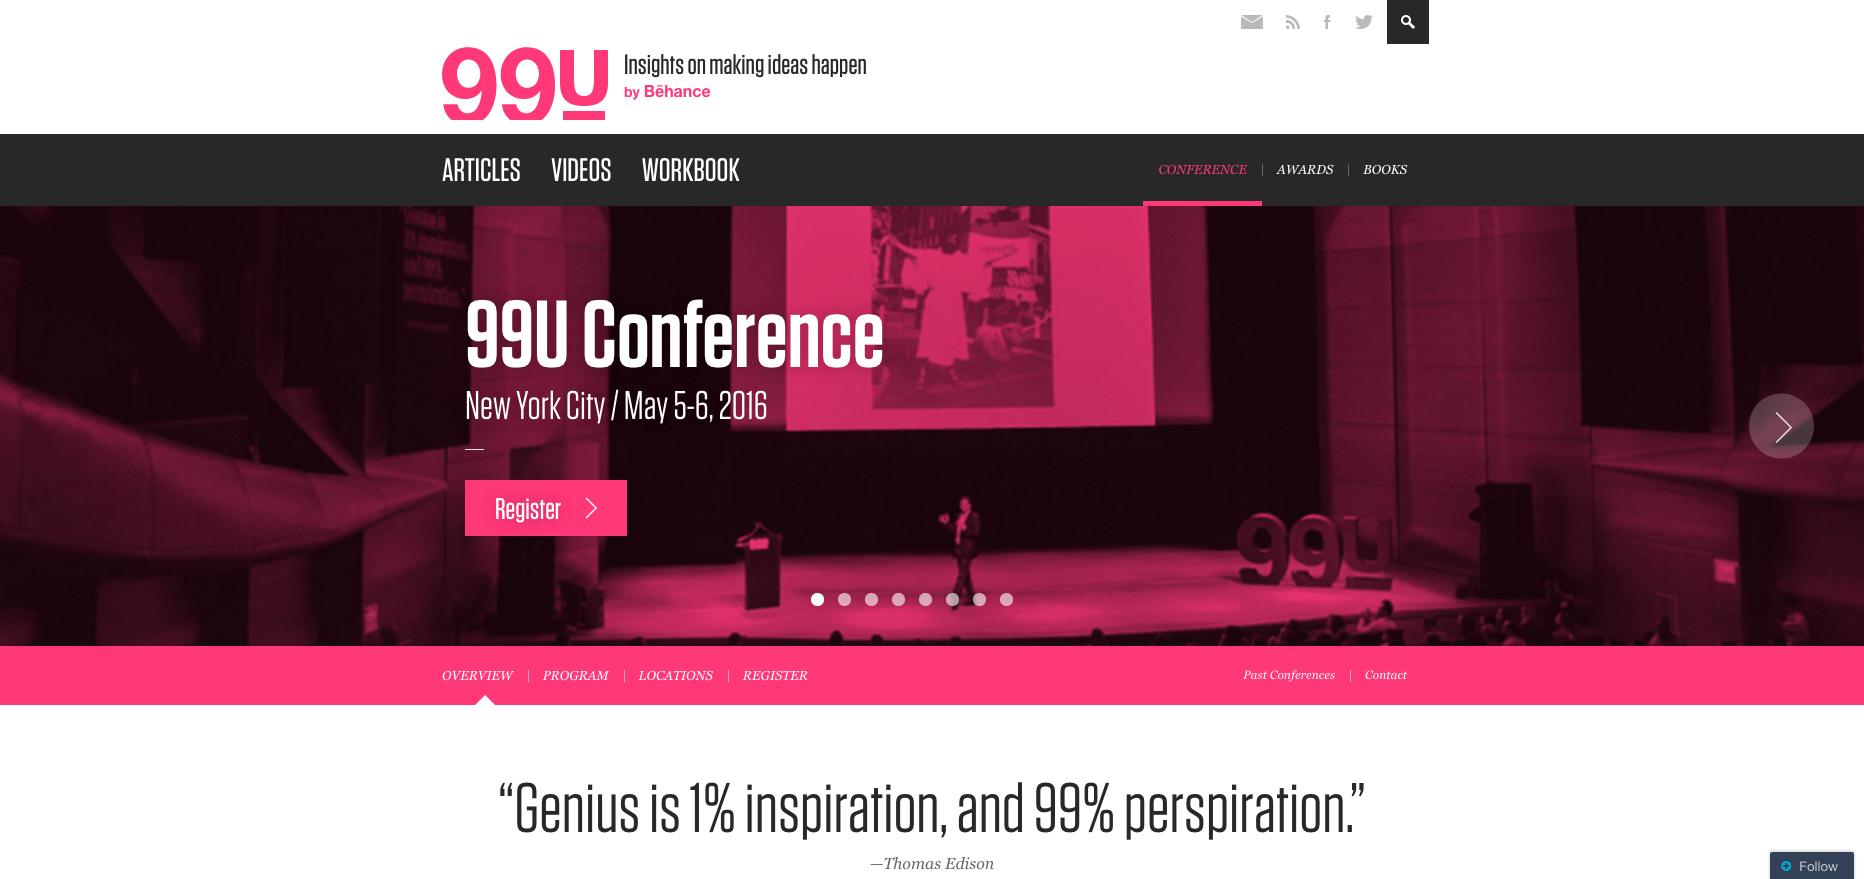 99U_Conference.png